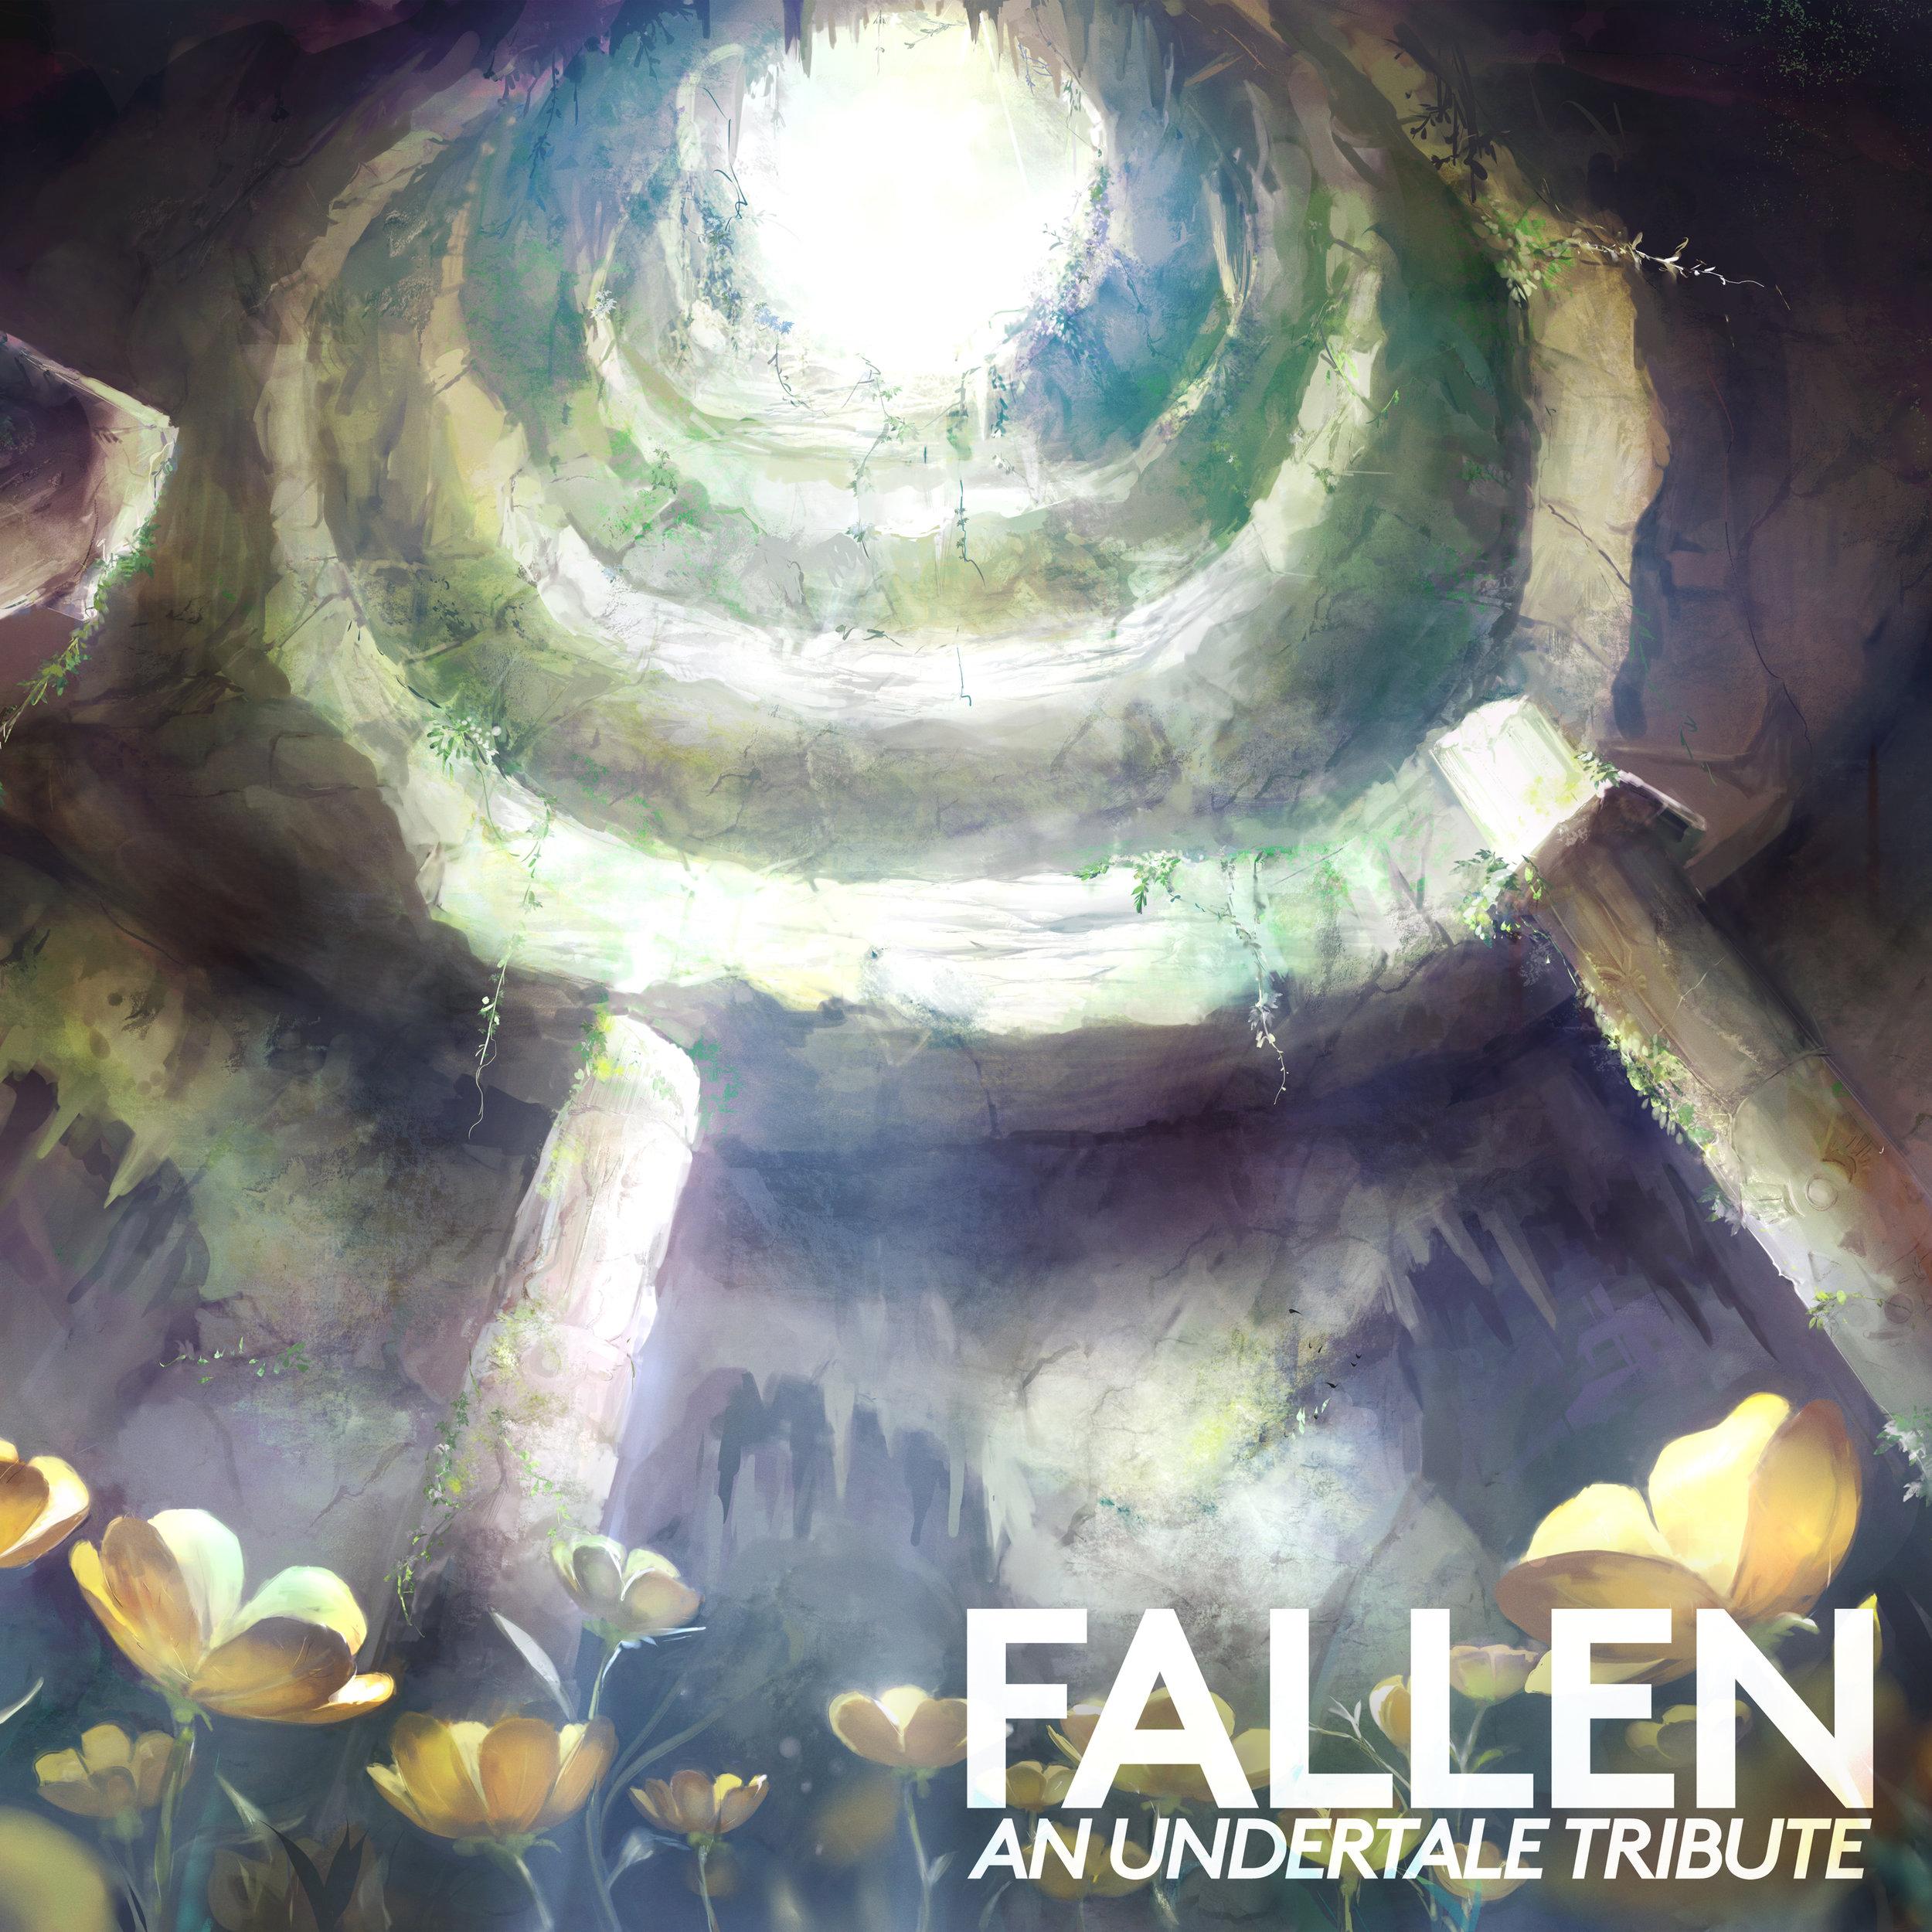 fallen-undertale-tribute-album-cover.jpg